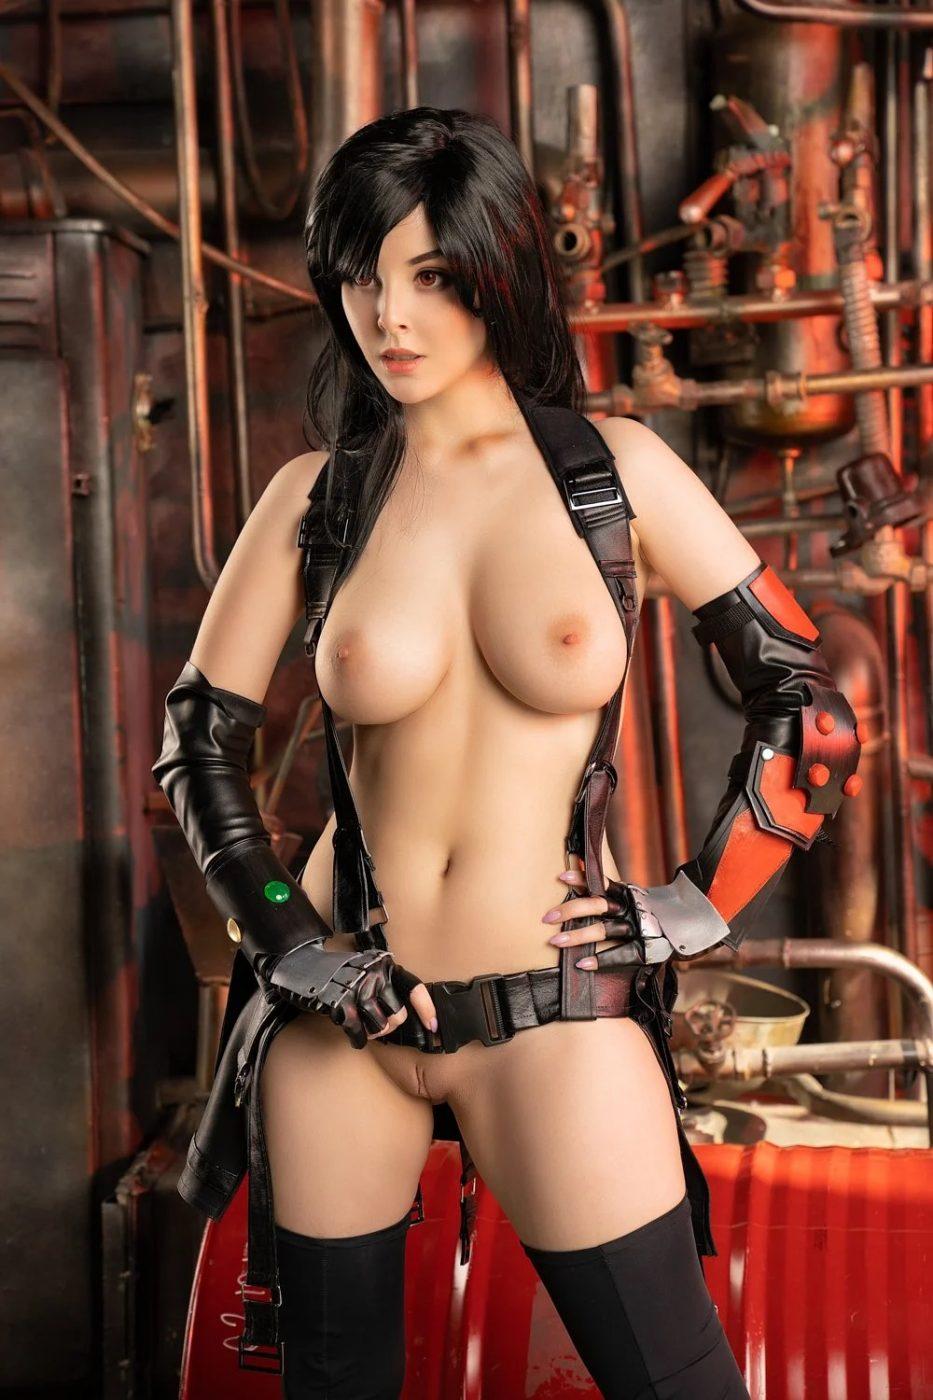 Helly von Valentine as Tifa Lockhart (Final Fantasy VII) full frontal nude babe